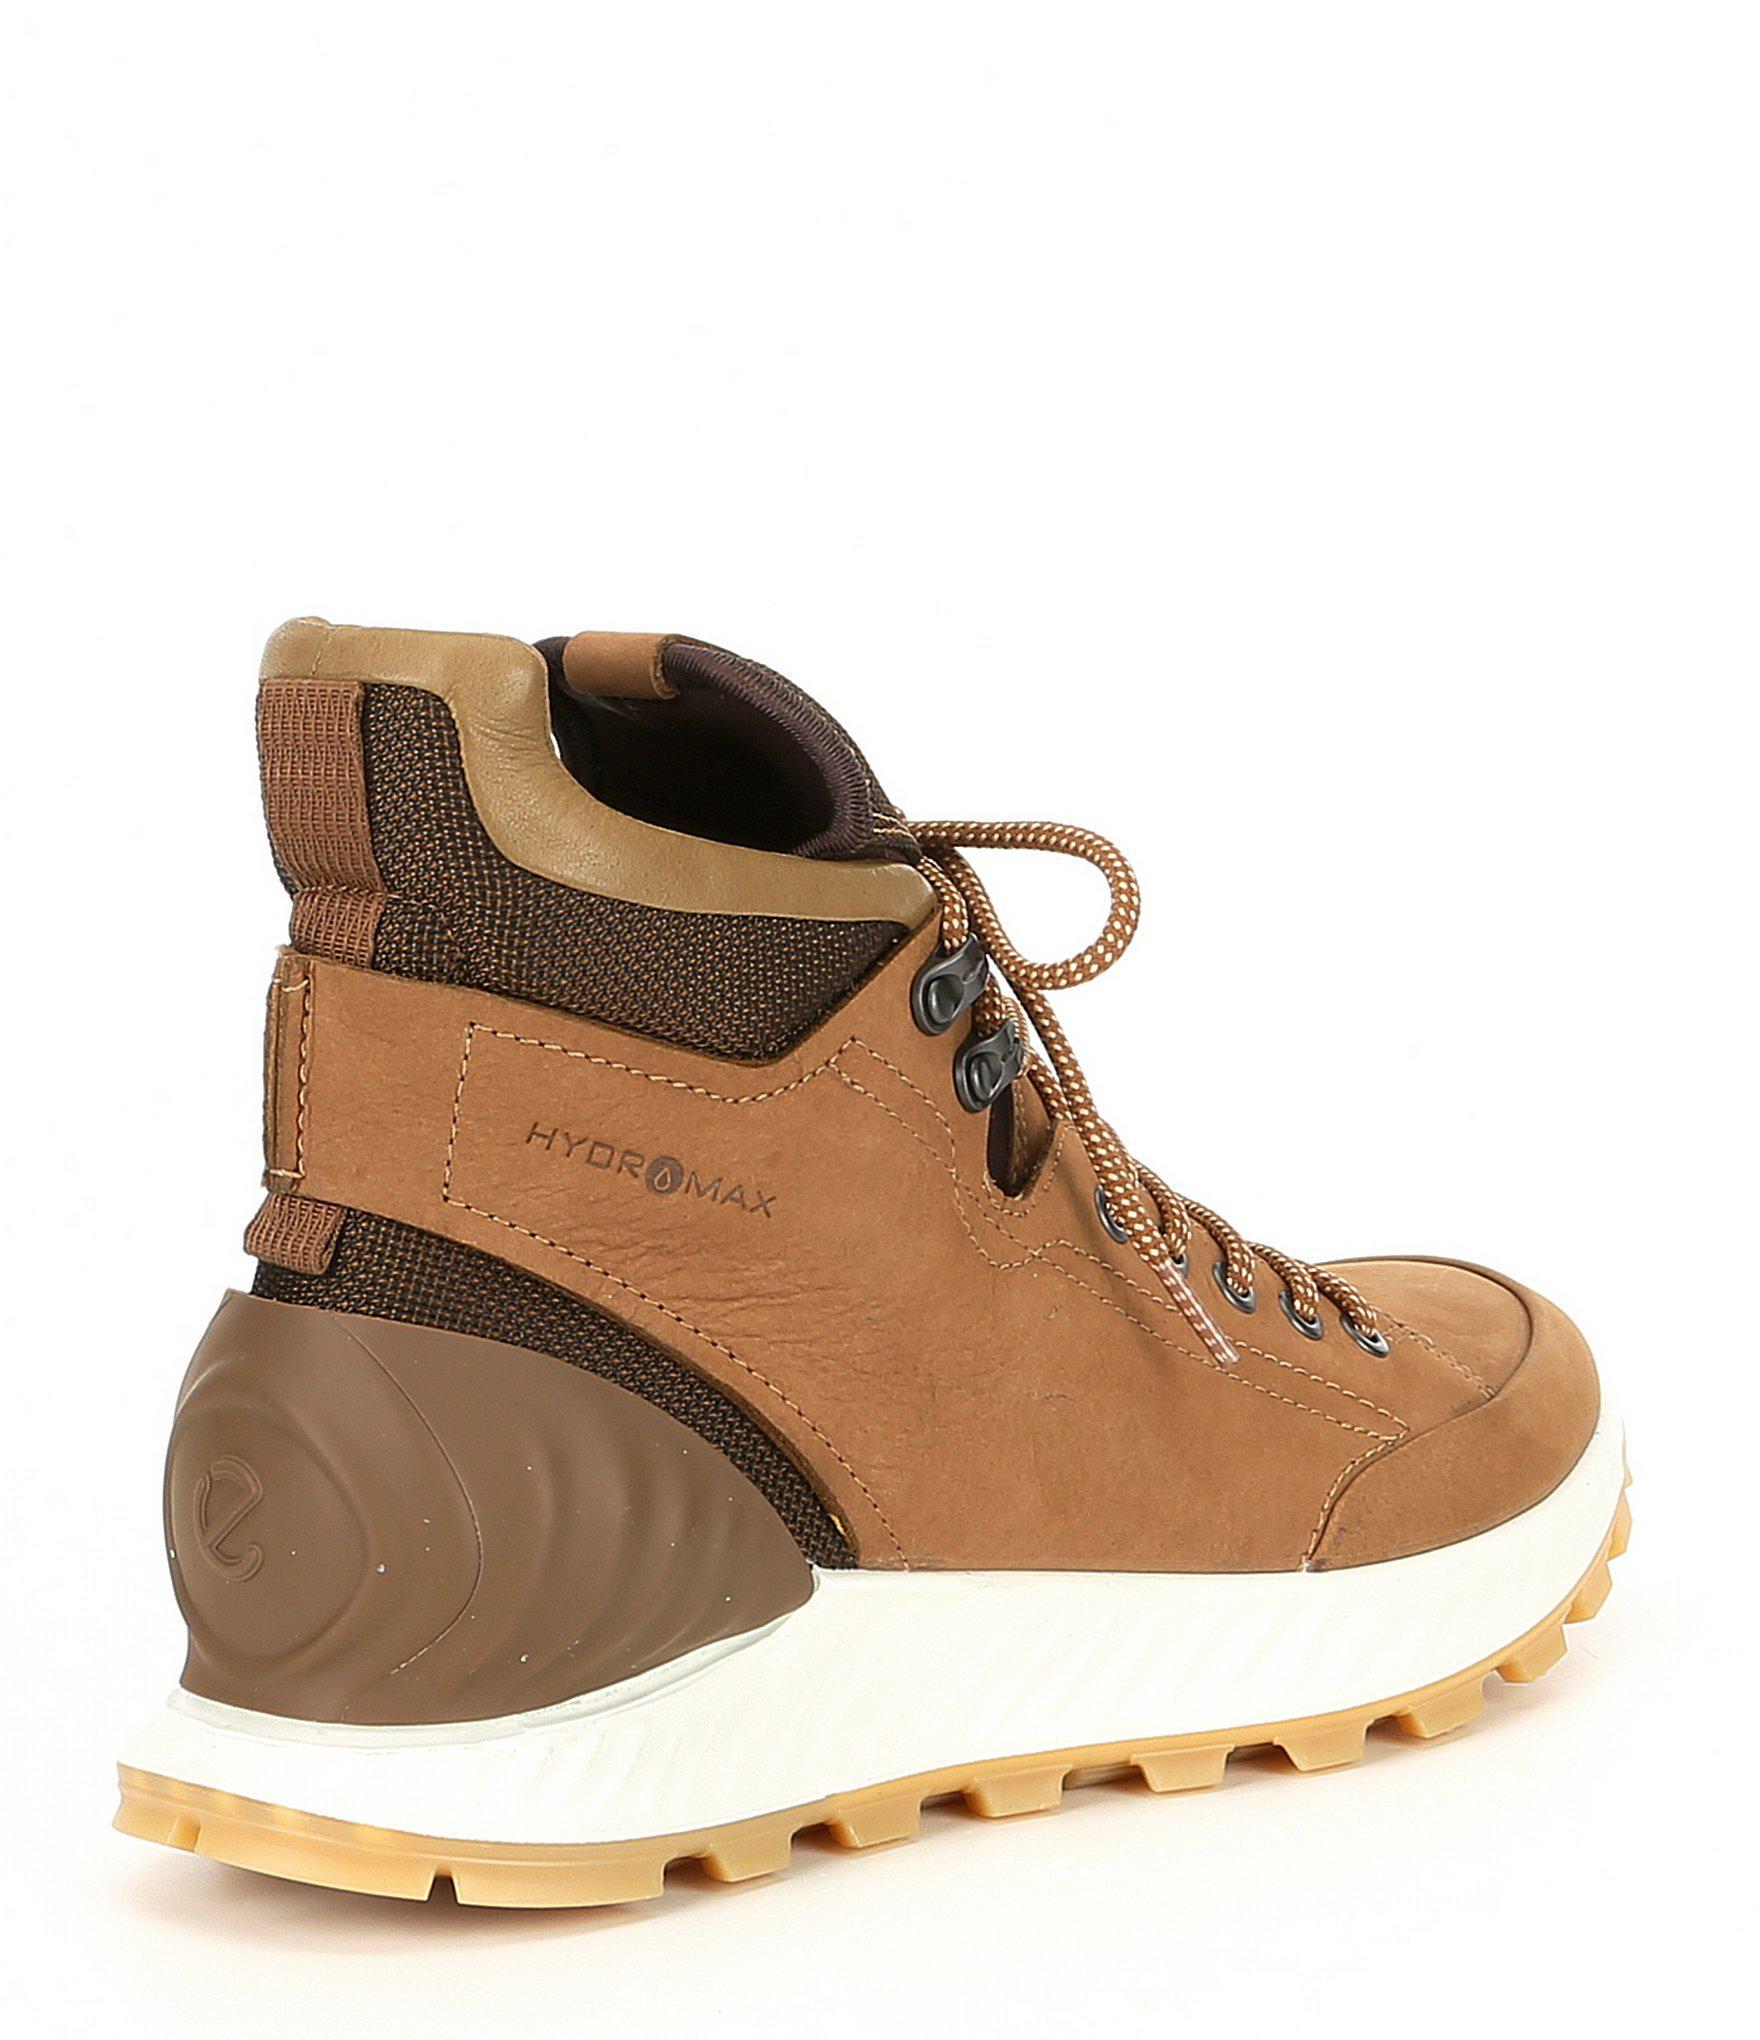 ecco work boots